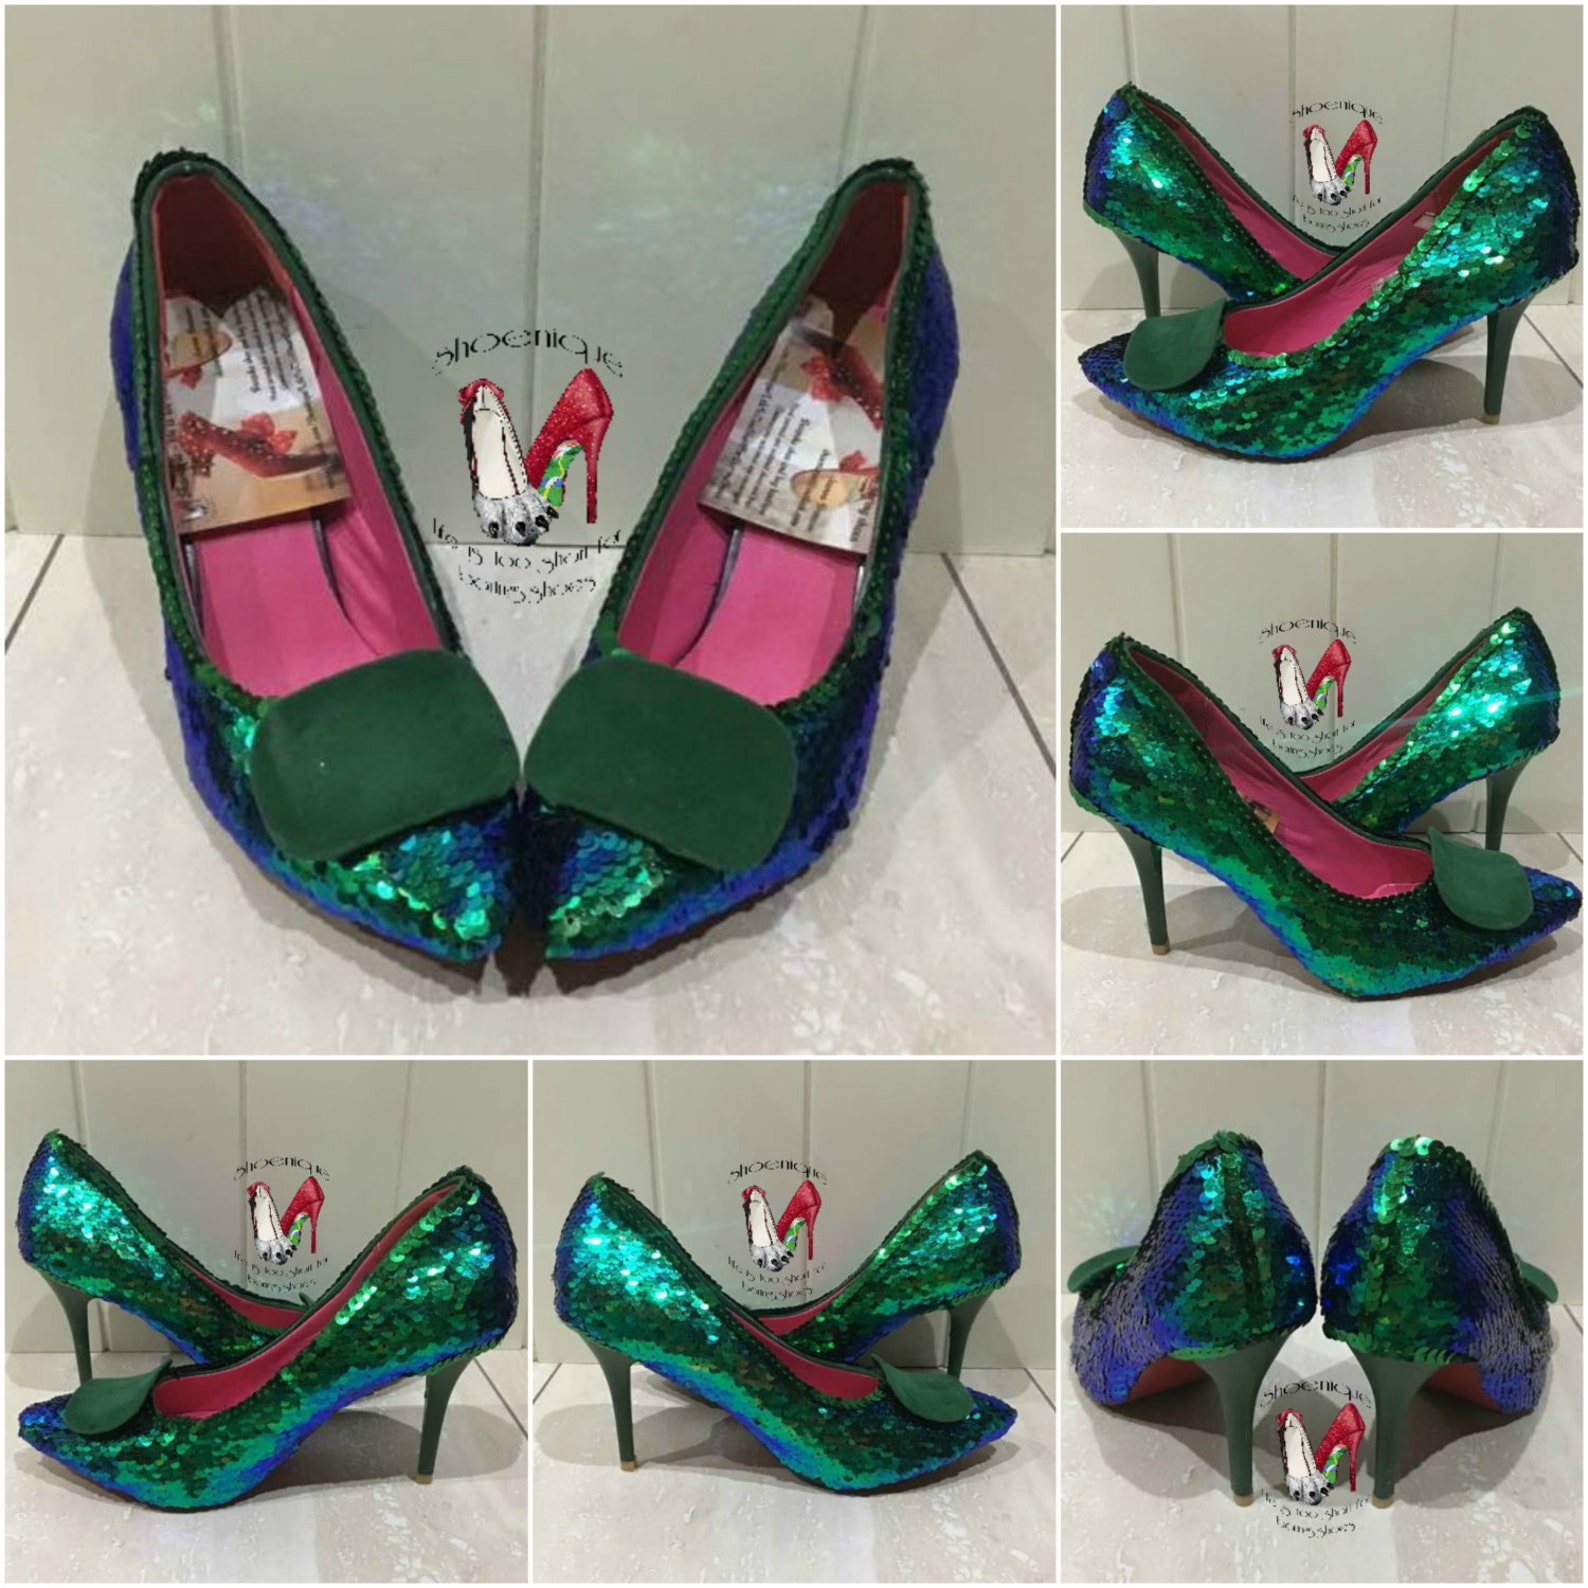 mermaid scales reversible sequins shoes heels uk bespoke fabric size 3 4 5 6 7 8 platform flats ballet pumps